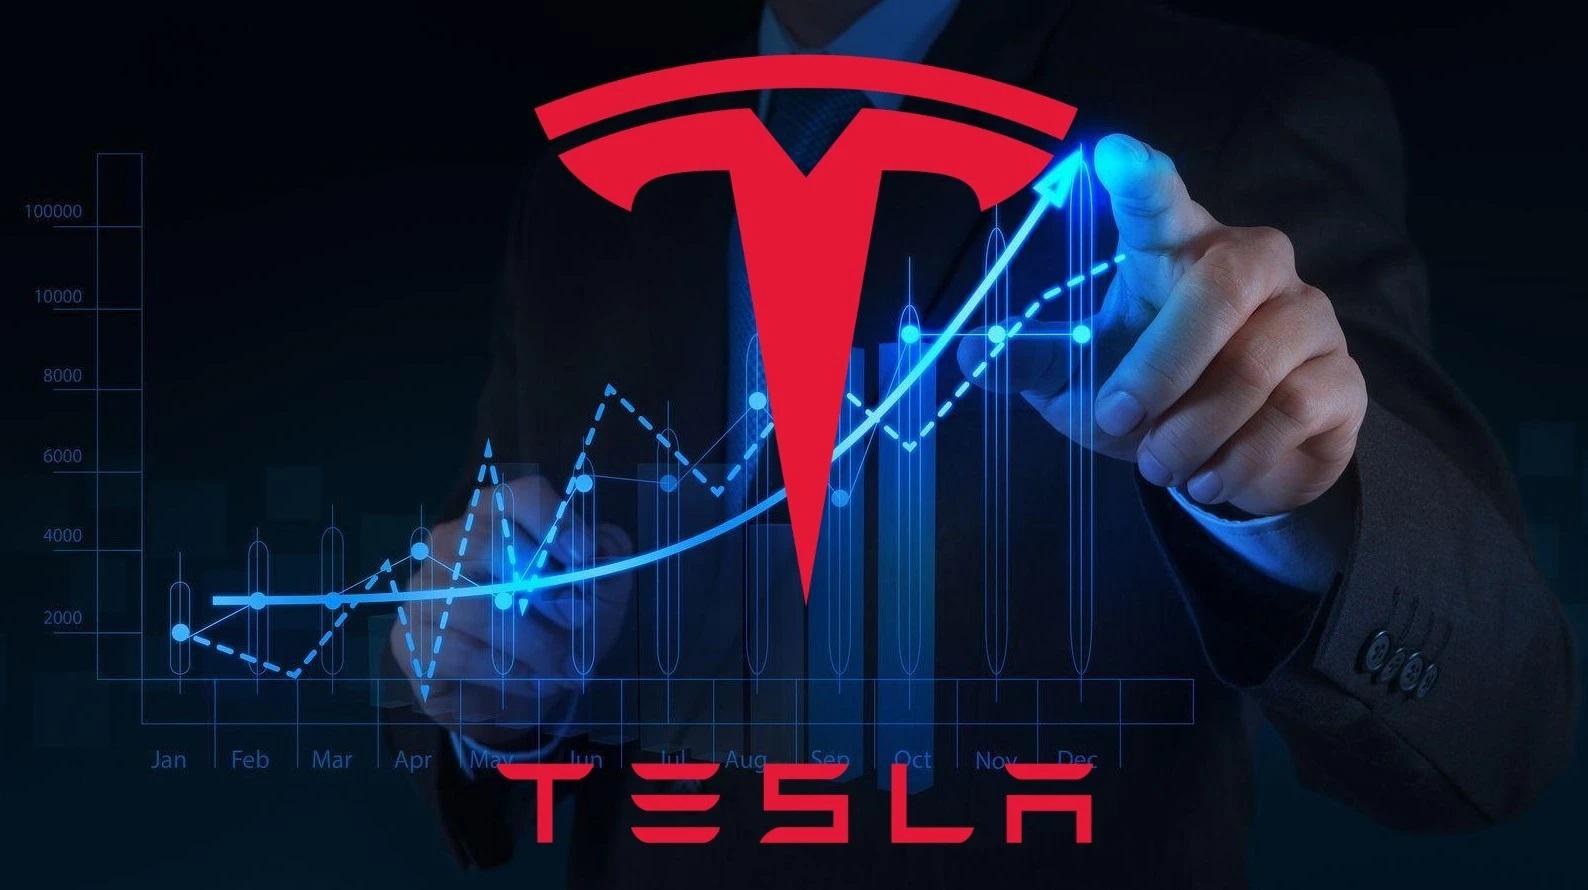 tesla energy - درآمد Tesla Energy به 200 میلیارد دلار خواهد رسید